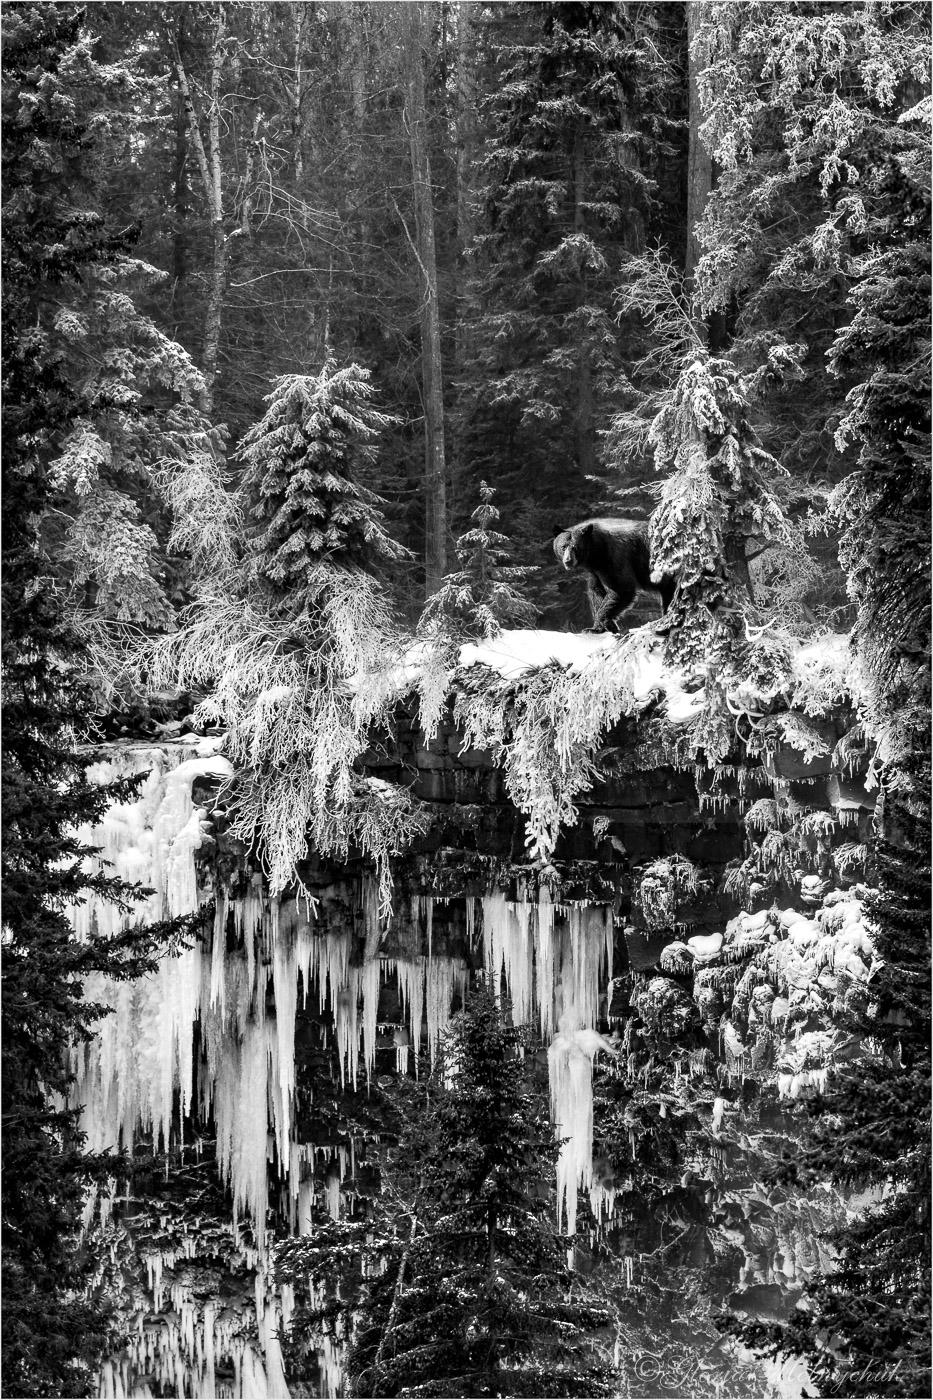 Mahood Falls Bear ©Gloria Melnychuk